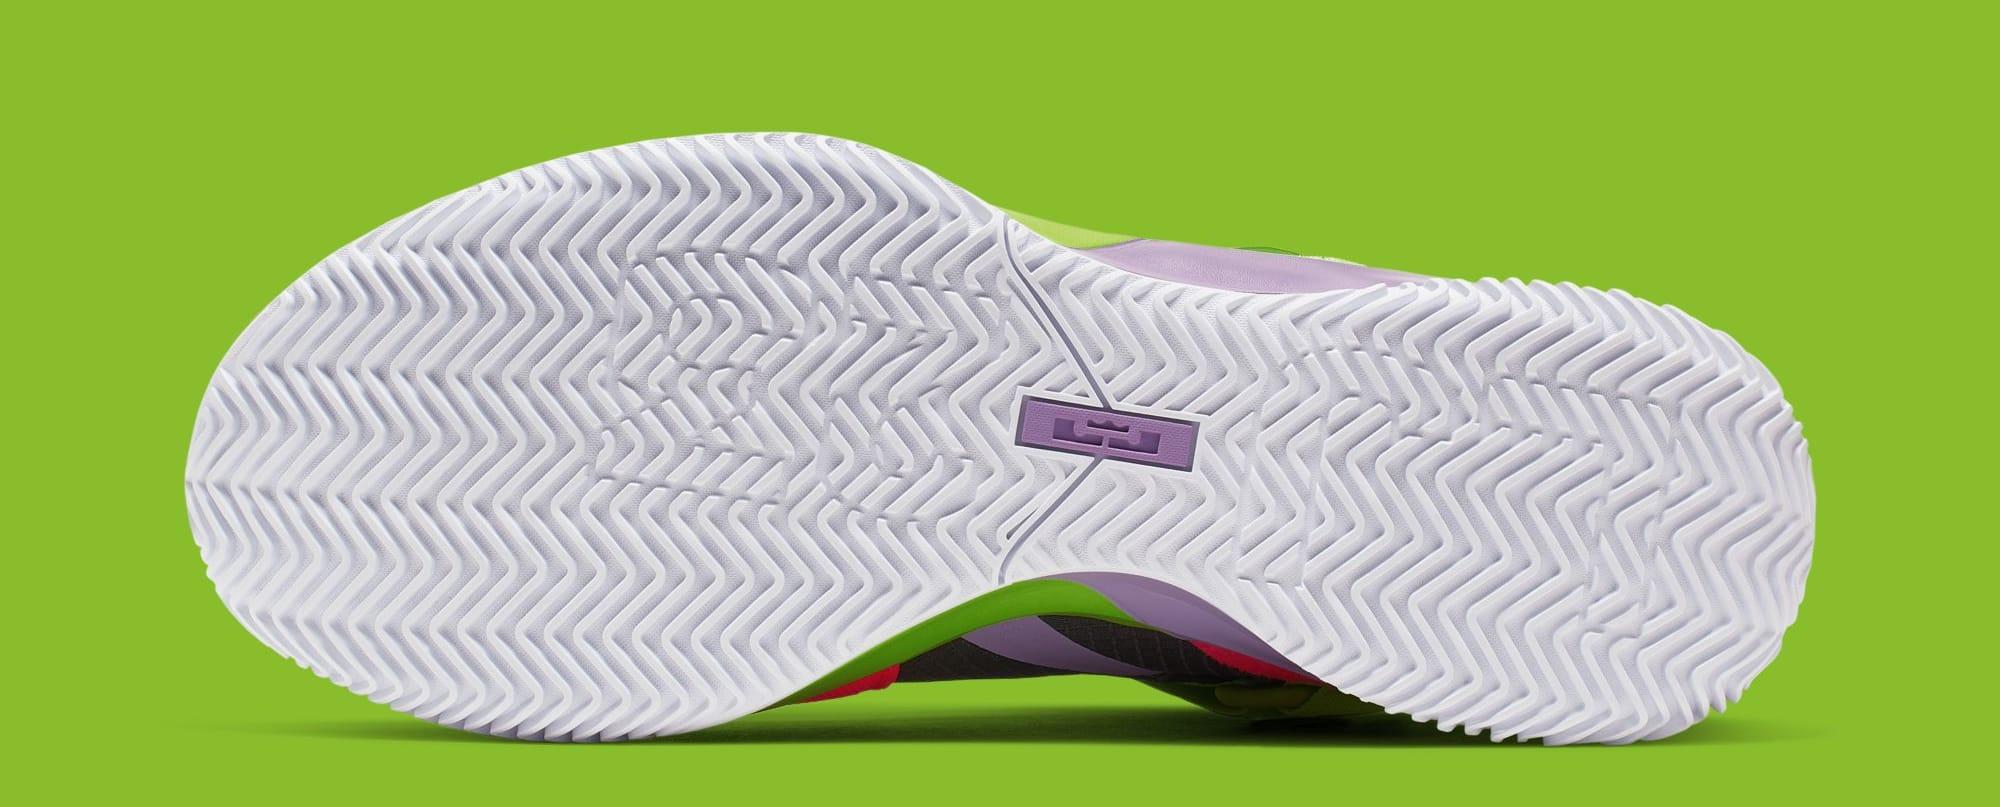 Nike LeBron Soldier 13 AR4228-002 (Sole)